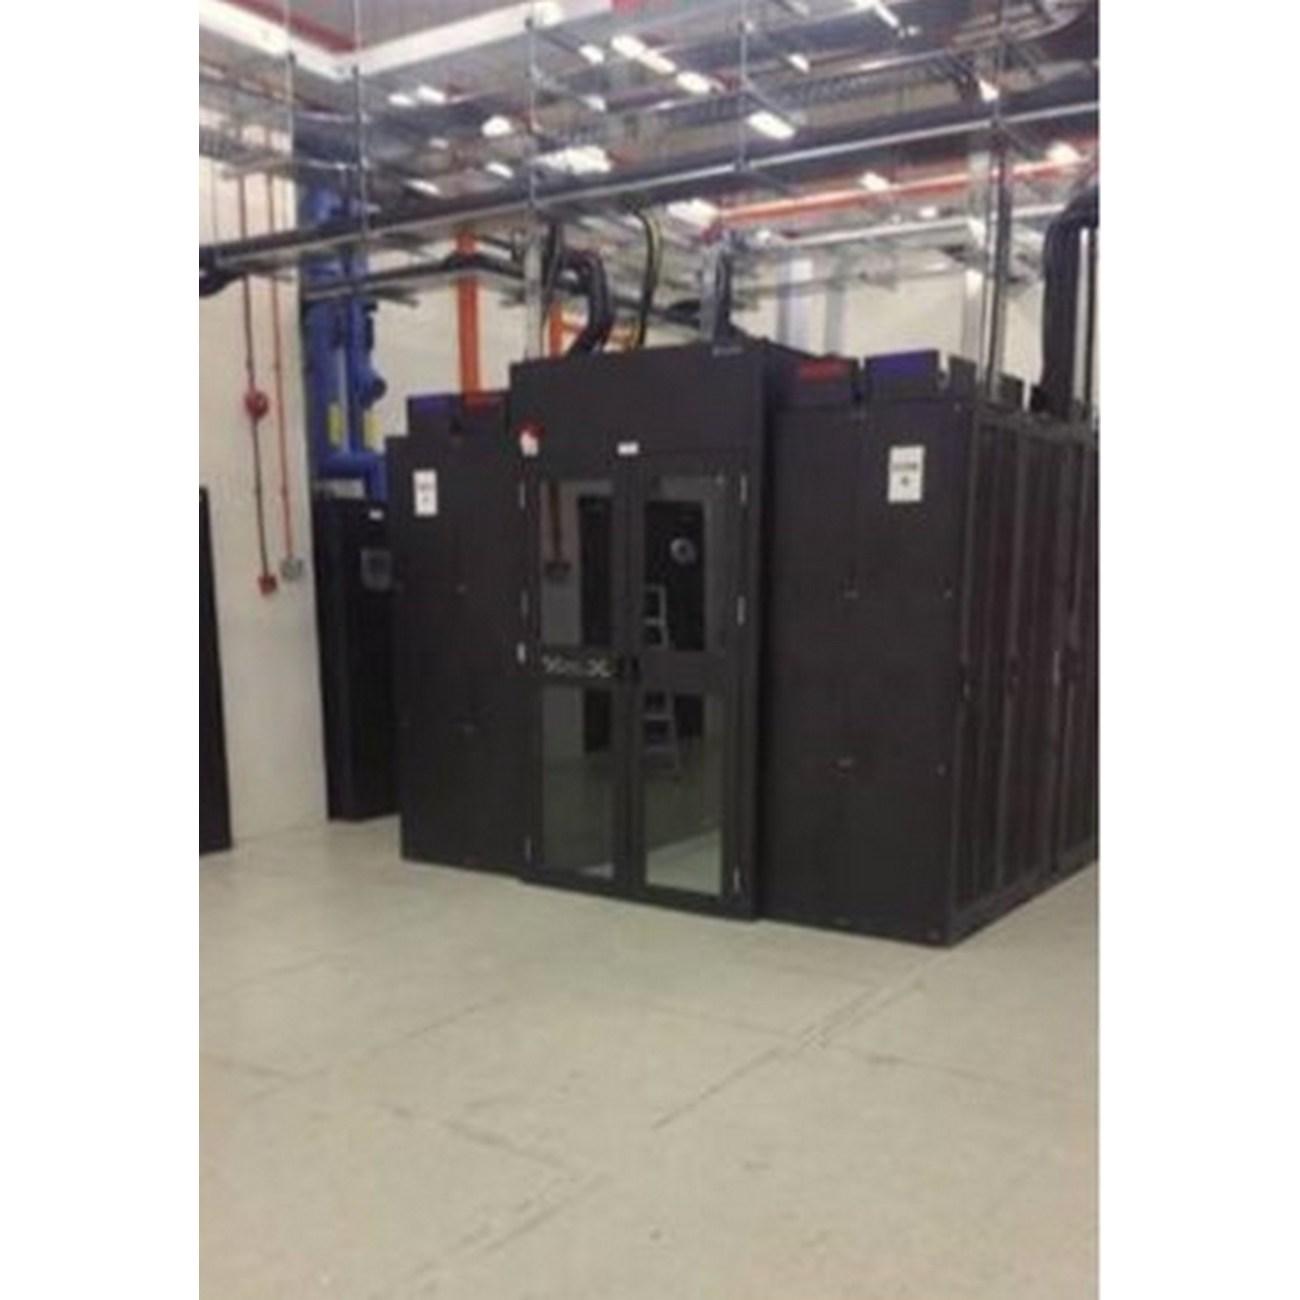 Fiber Optics & Structure Cabling (17)